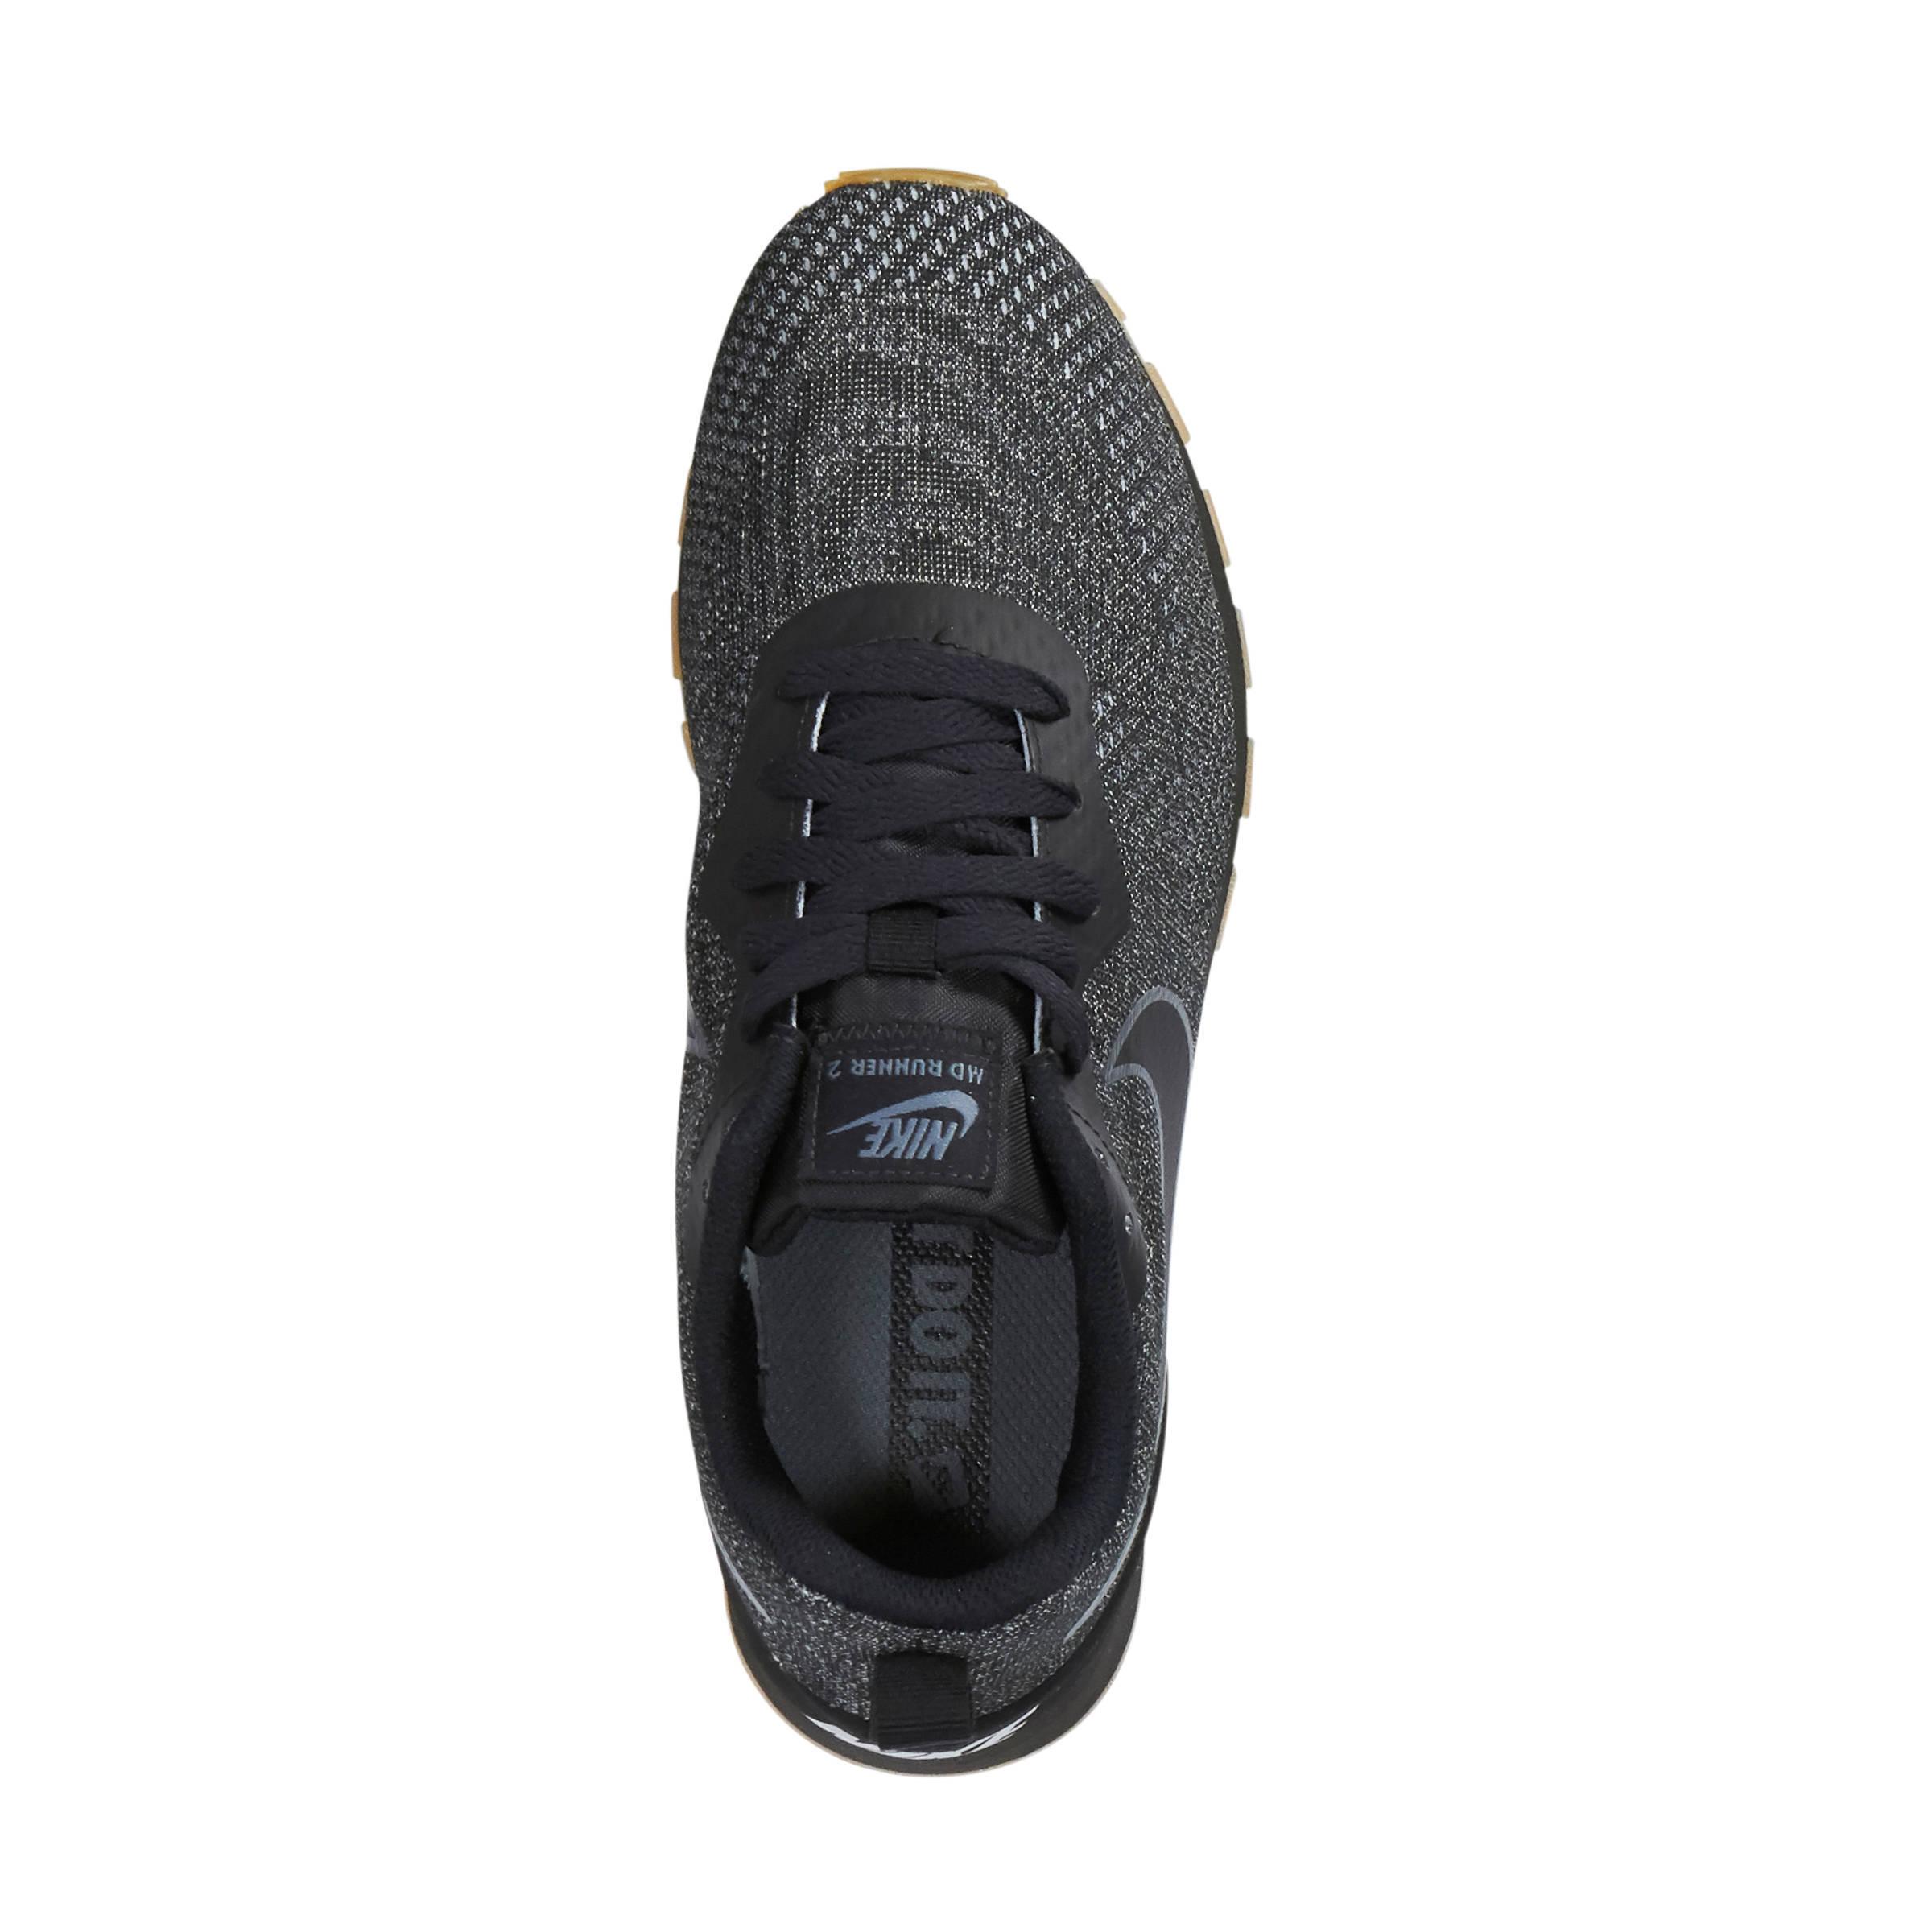 07cf7f51115 sneakers Nike zwart Mesh Eng 2 Runner wehkamp MD qwp4S